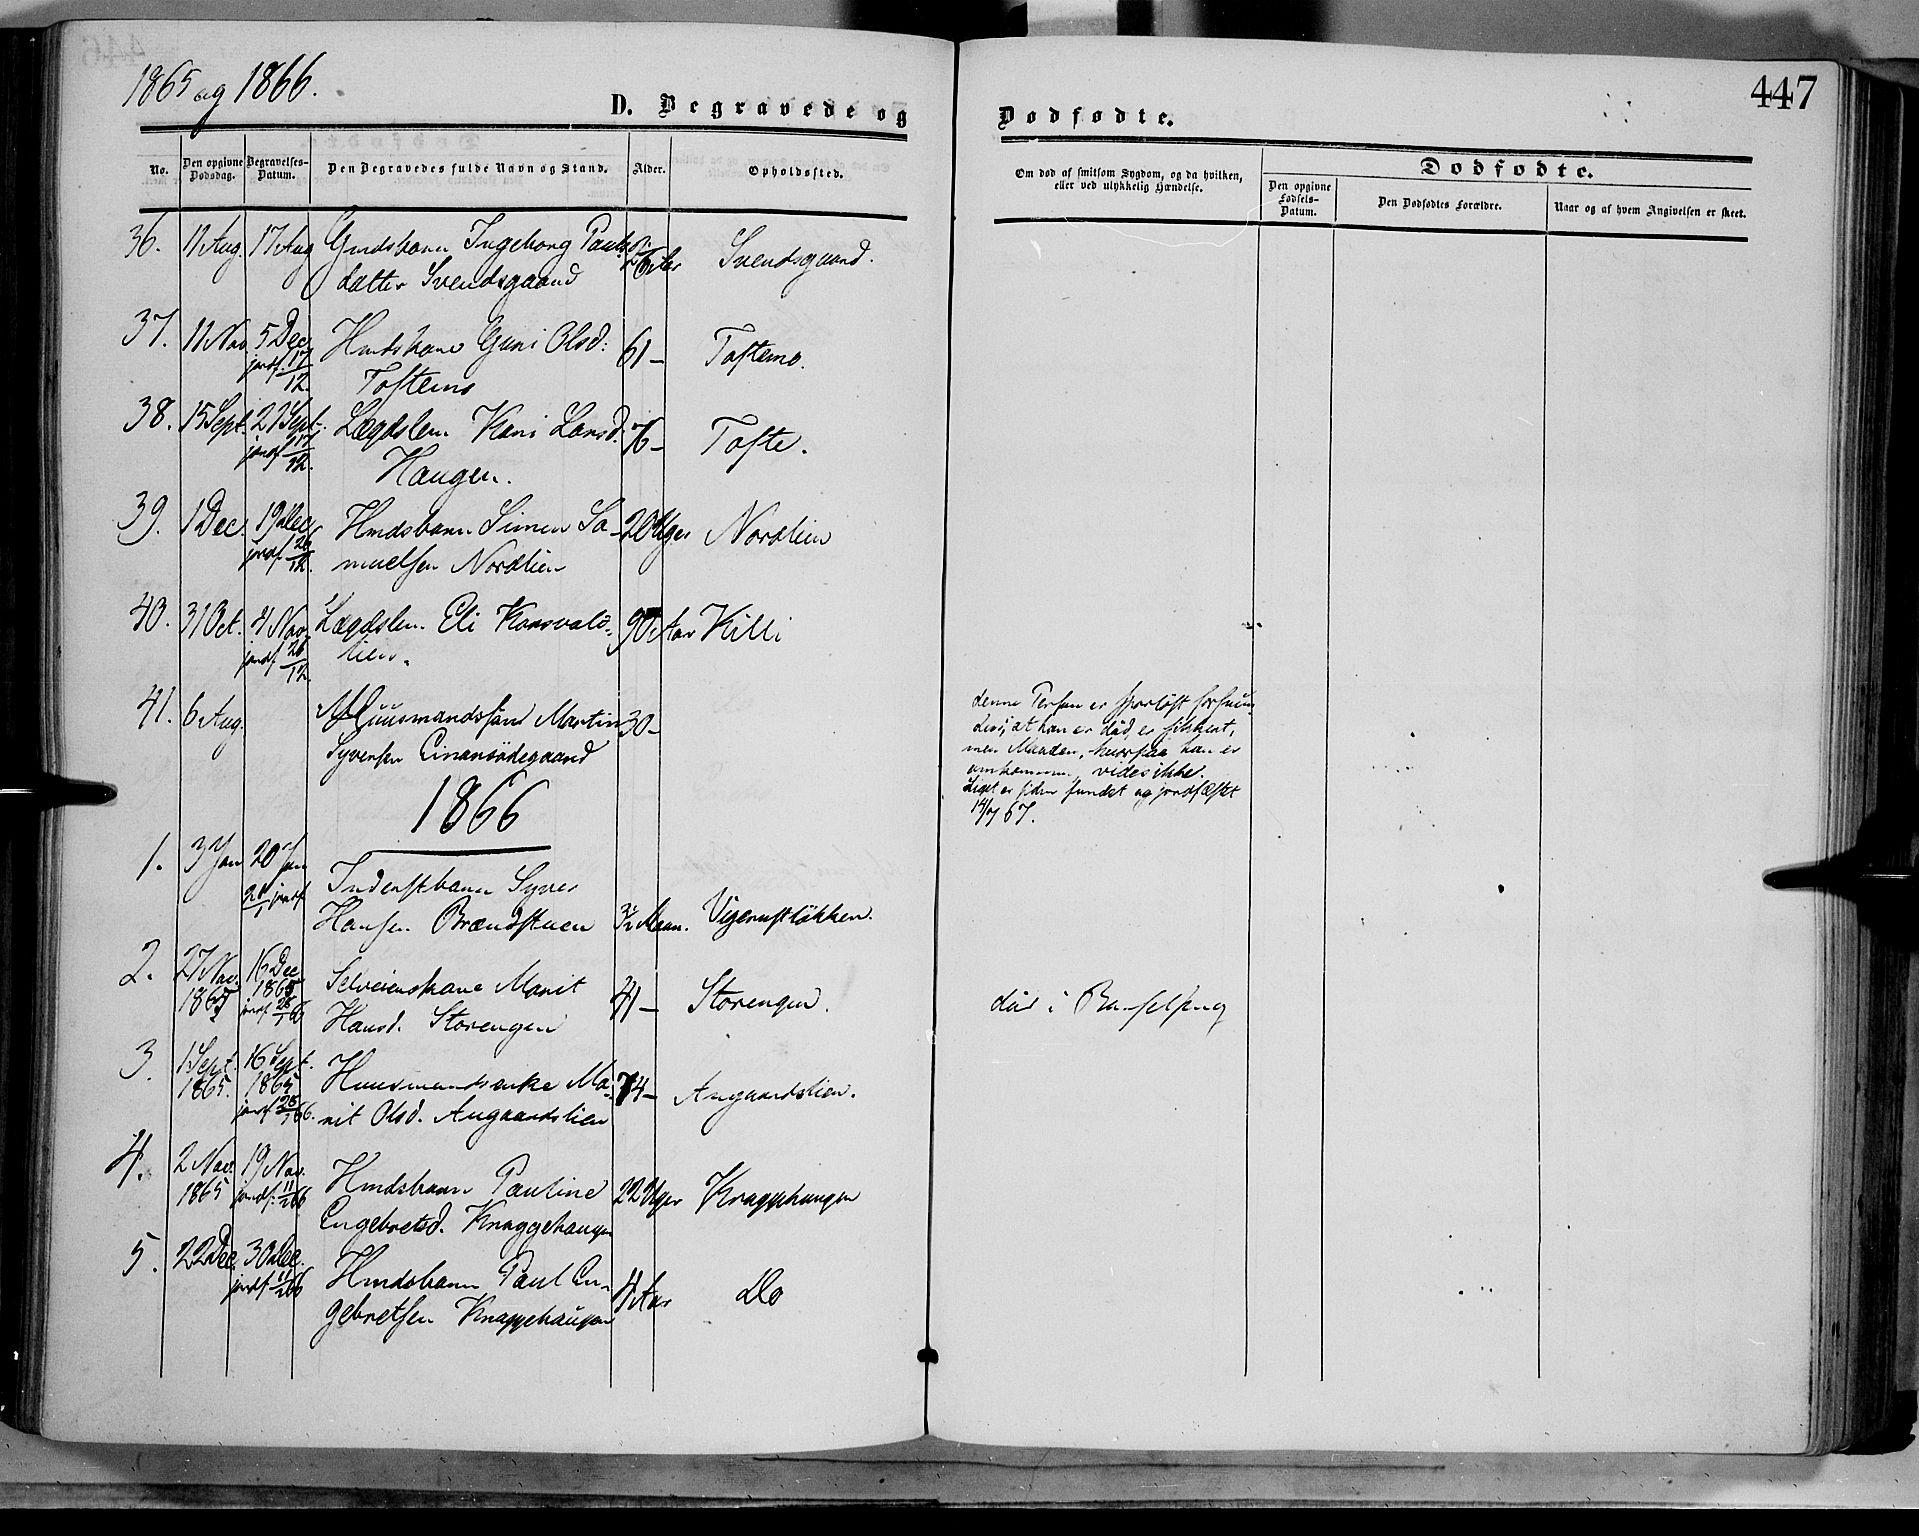 SAH, Dovre prestekontor, Ministerialbok nr. 1, 1854-1878, s. 447